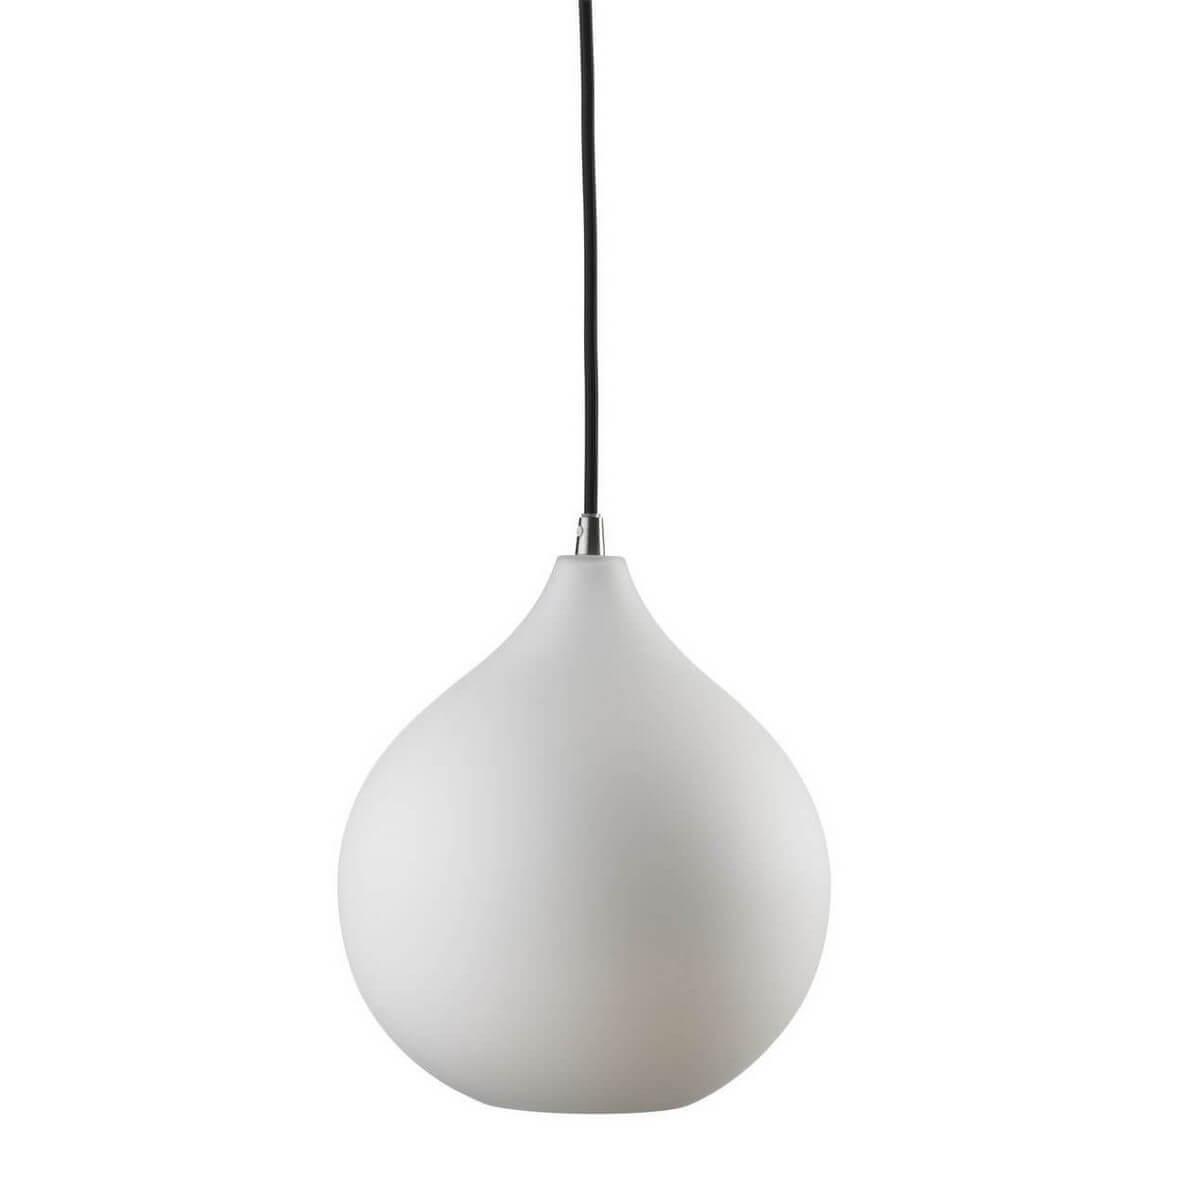 Светильник Markslojd 104336 Vattern подвесной светильник markslojd stromstad 105246